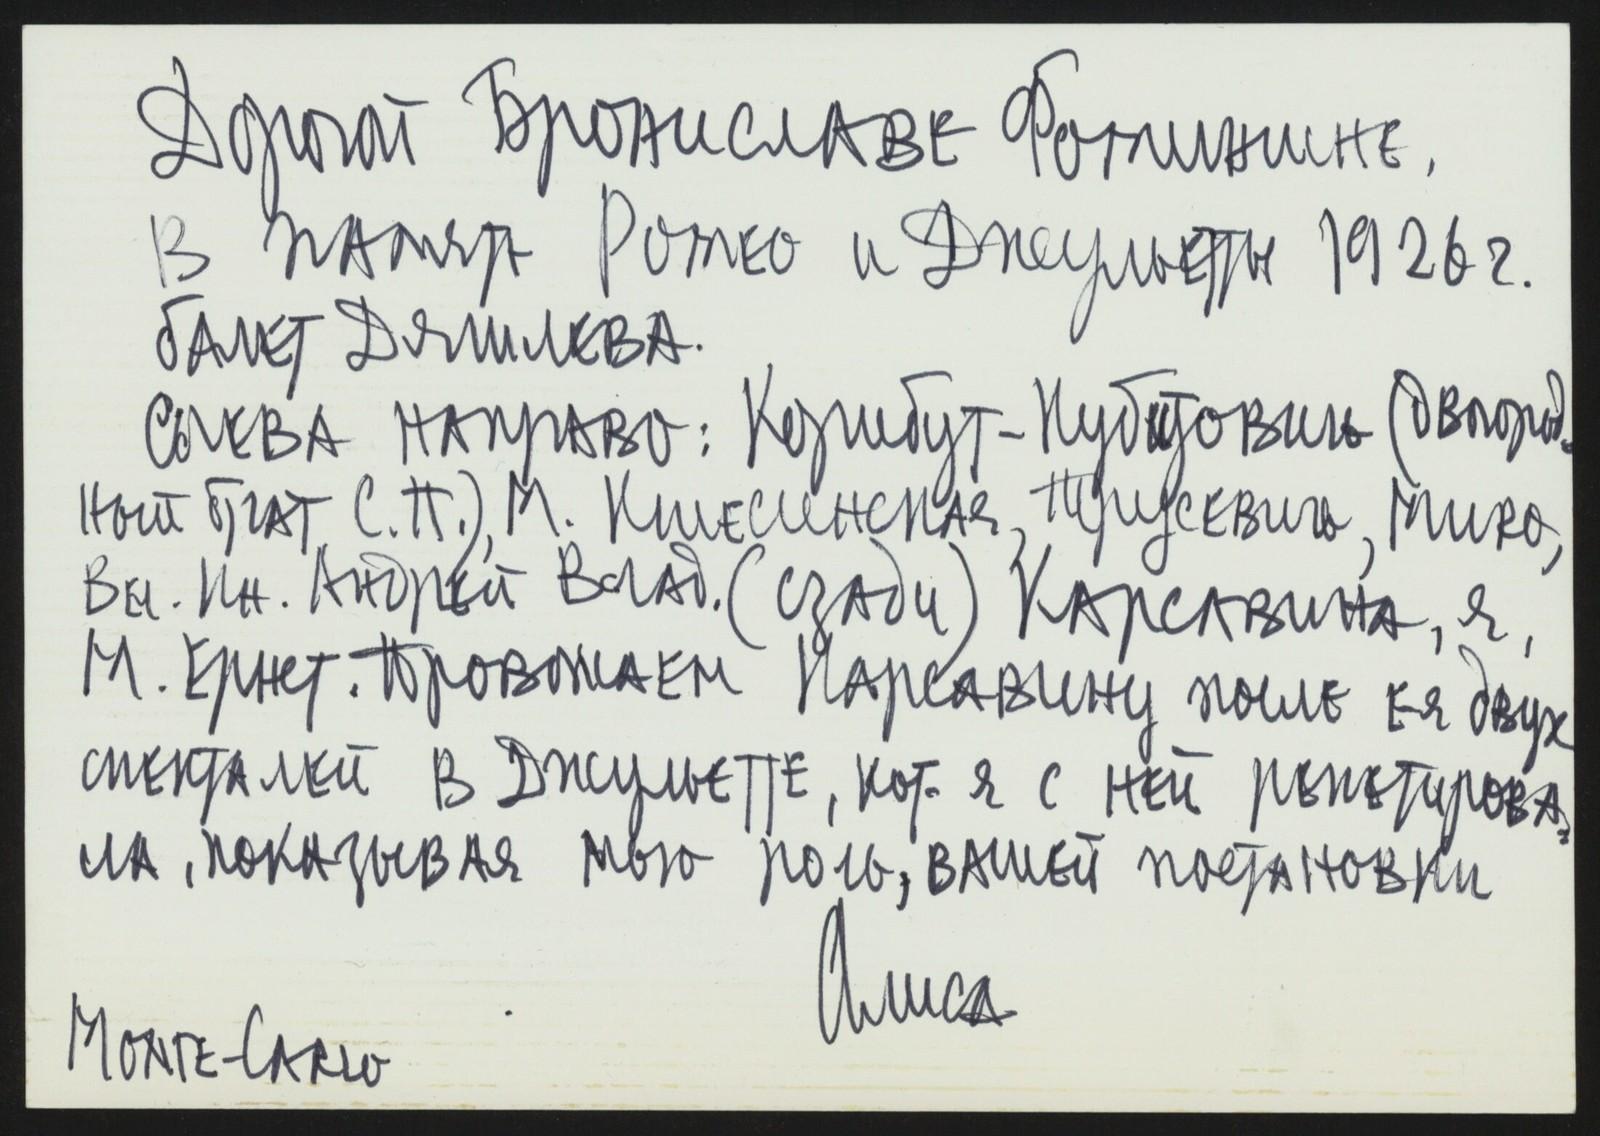 Photograph of (L to R) Pavel Koribut-Kubitovich (cousin of Diaghilev), Mathilda Kshessinka, [?] Trusevich, Juan Miro, Grand Duke Andrei Vladimirovitch, Tamara Karsavina, Alive Nikitina, and Max Ernst